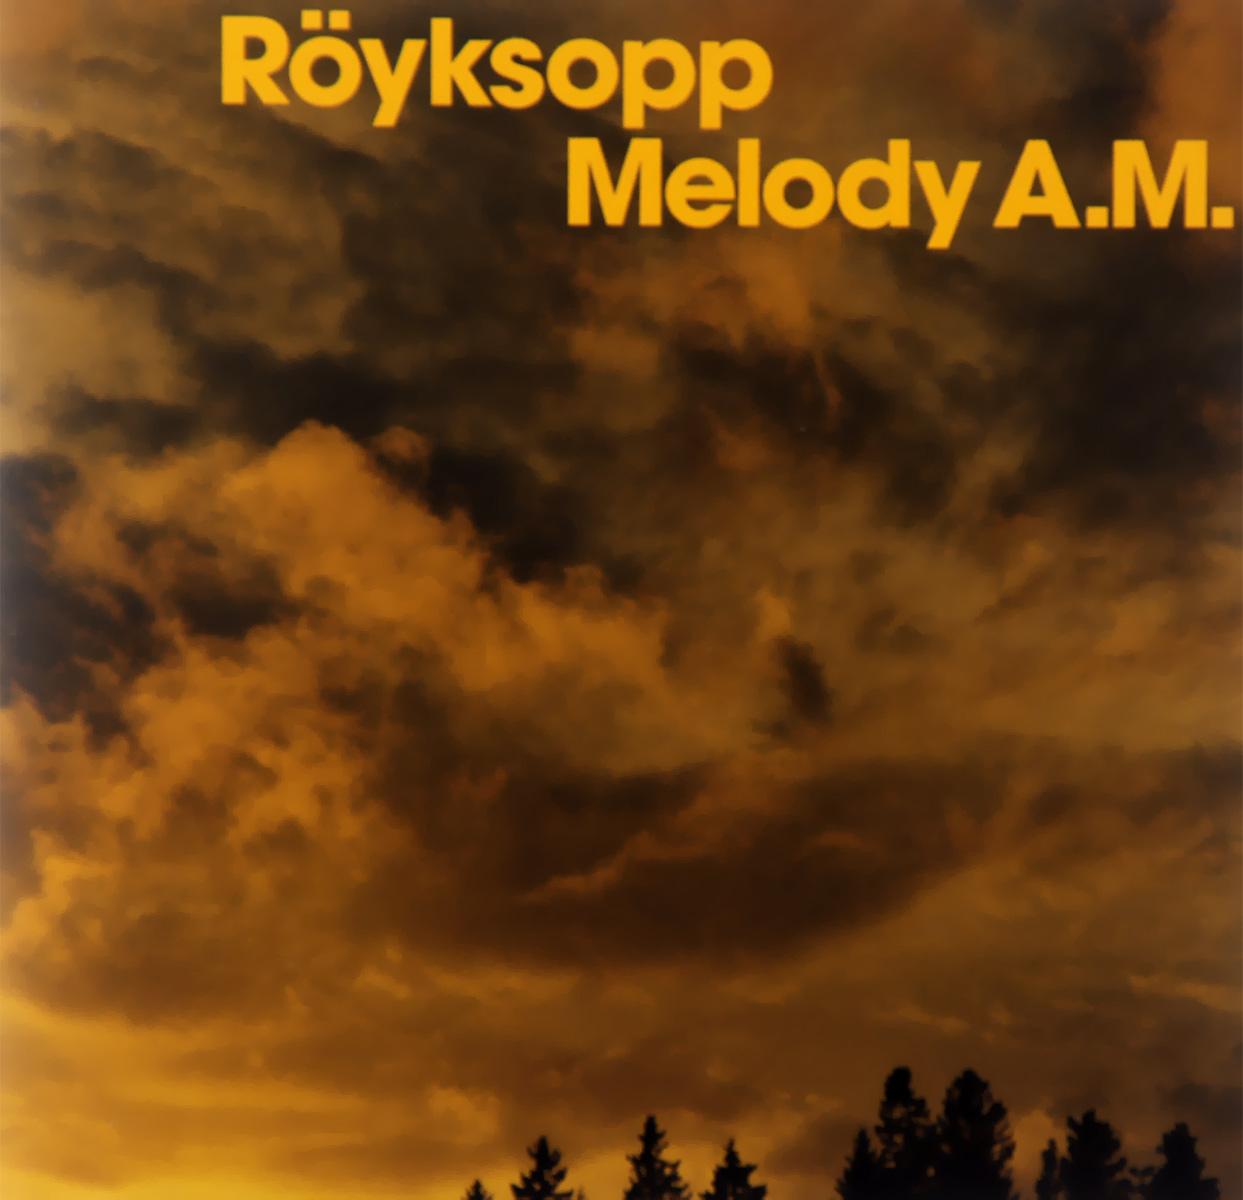 Royksopp. Melody A.M.